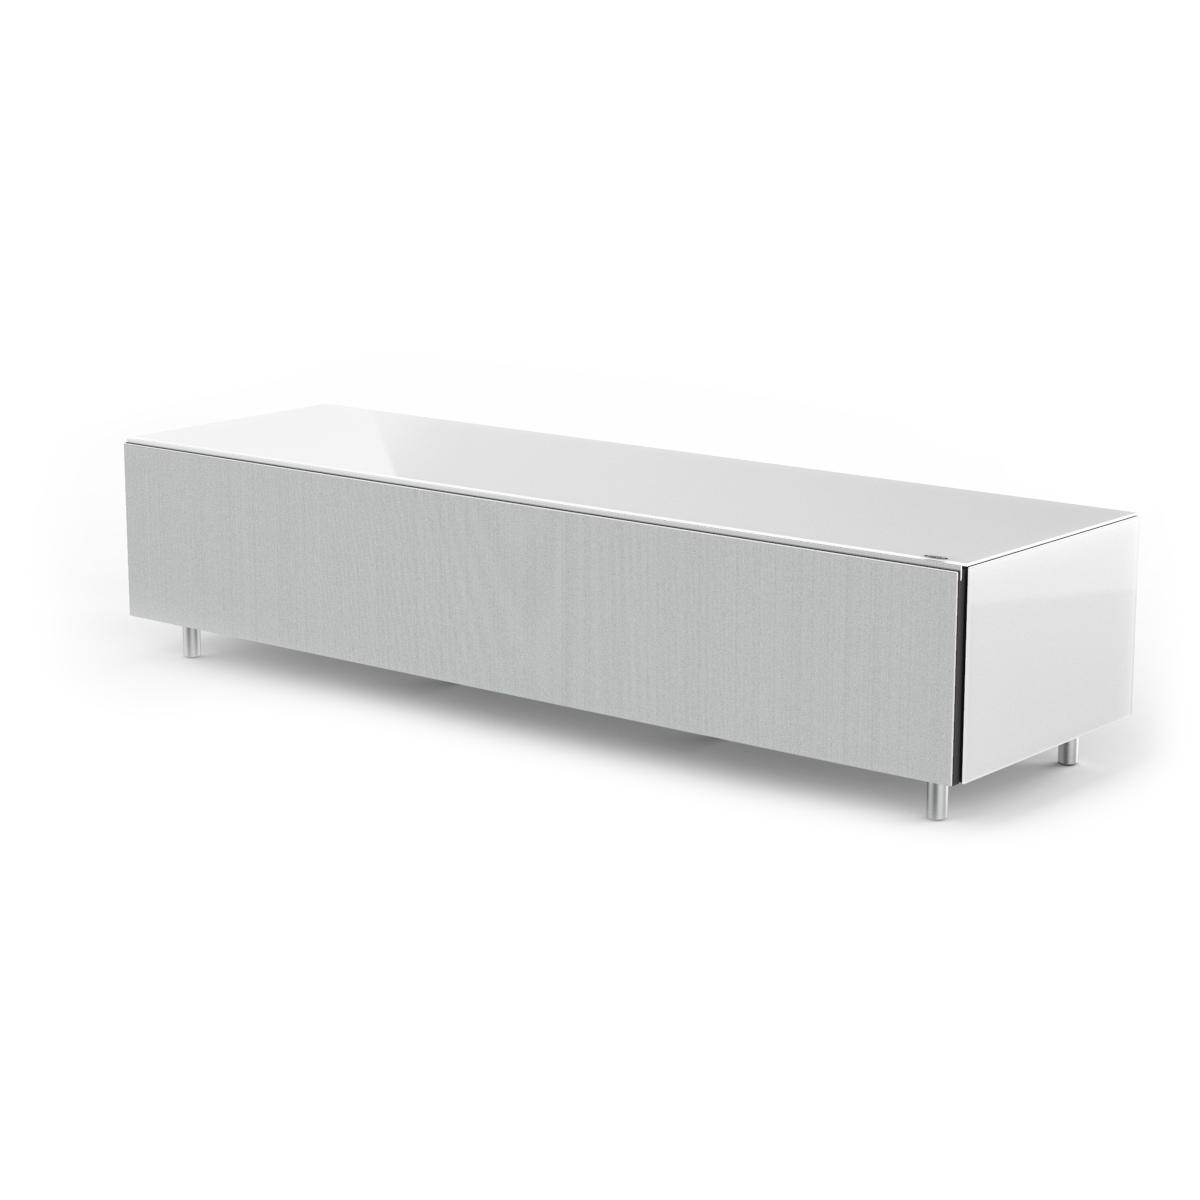 just racks jrl jrl1651s sng tv lowboard soundbarmobel bei hifi tv moebel de